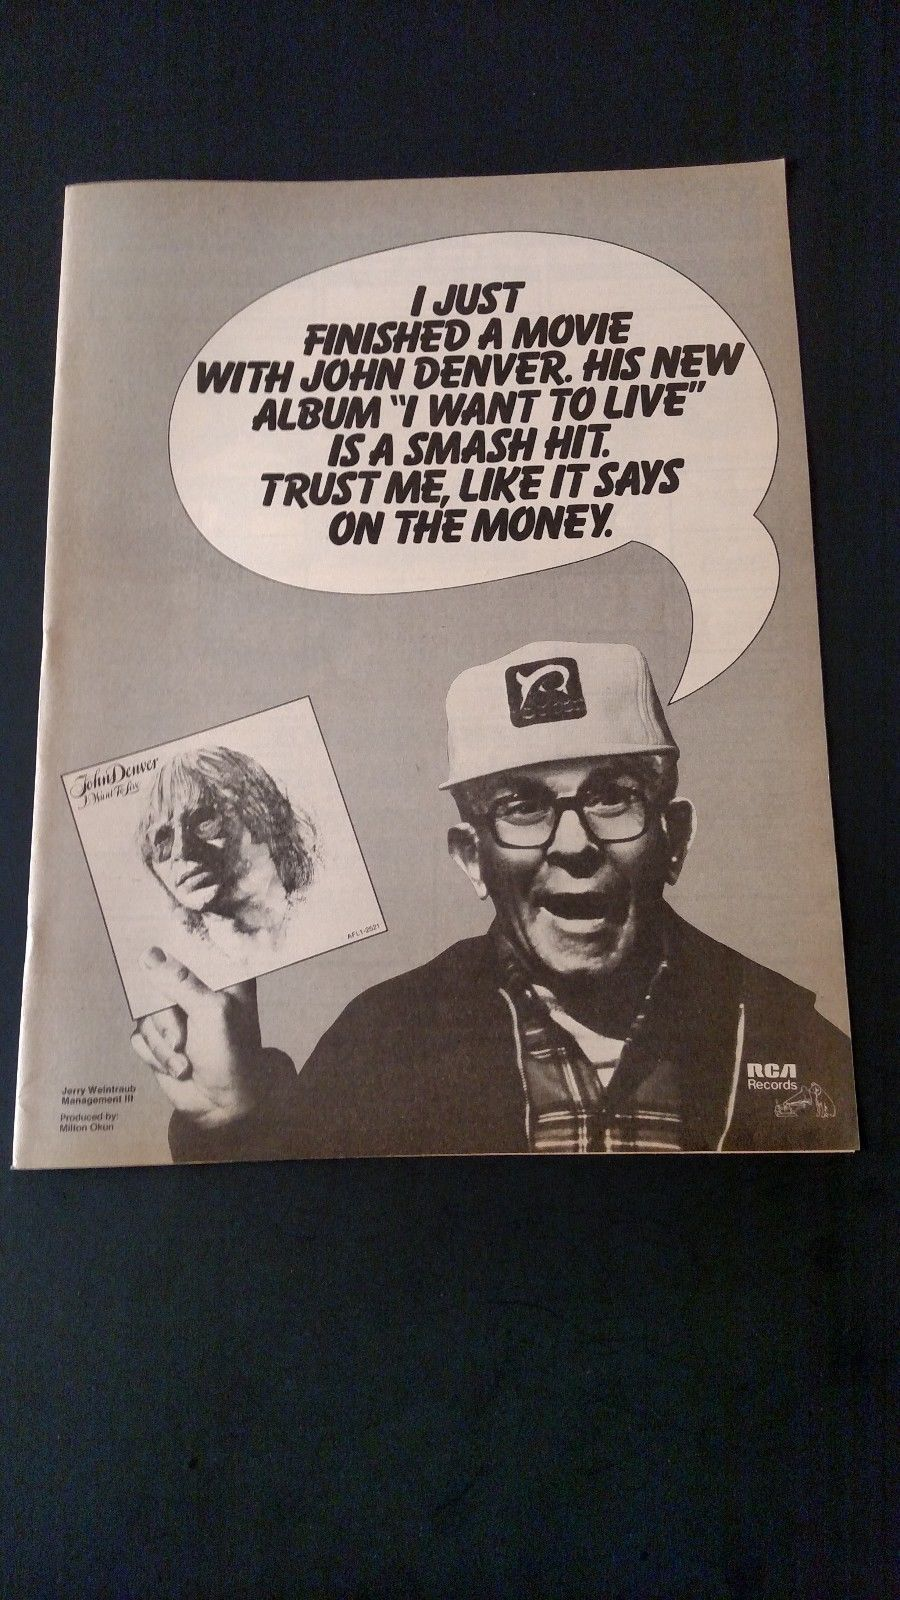 John denver grandma s feather bed sheet music - Rare Vintage Original Print Promo Poster Ad George Burns John Denver 1977 Ebay